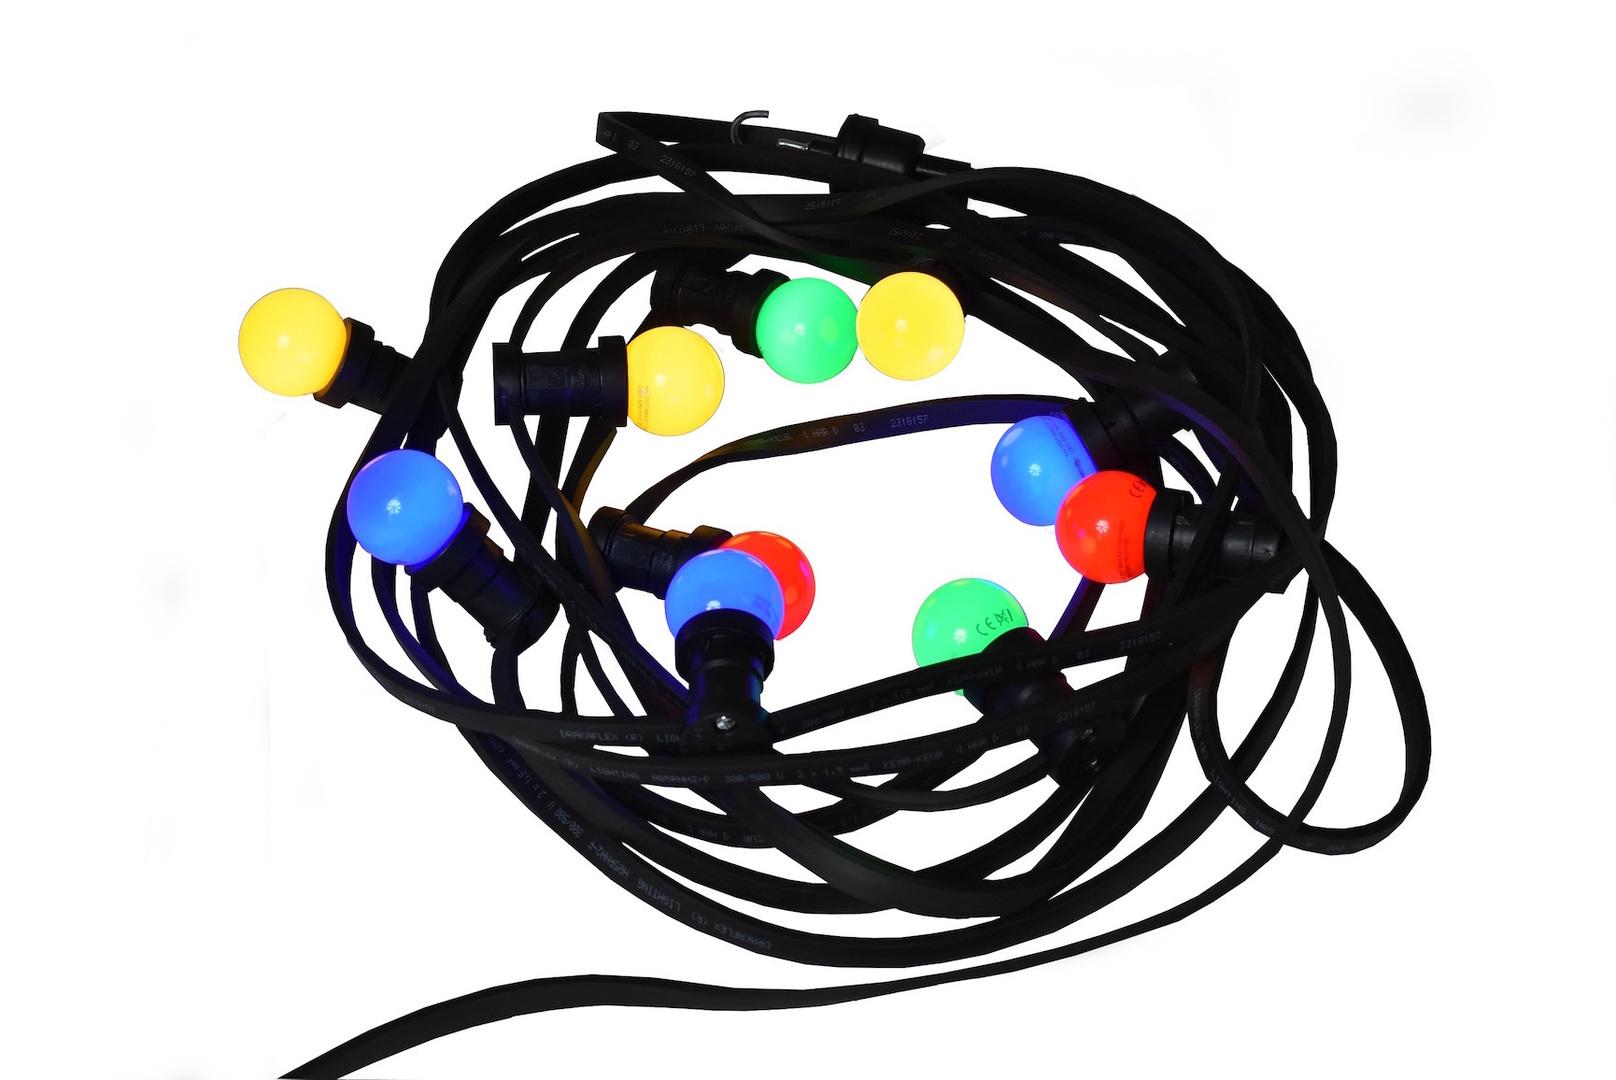 Light String for restaurant terrace - 20m with 20 multicolour LED bulbs